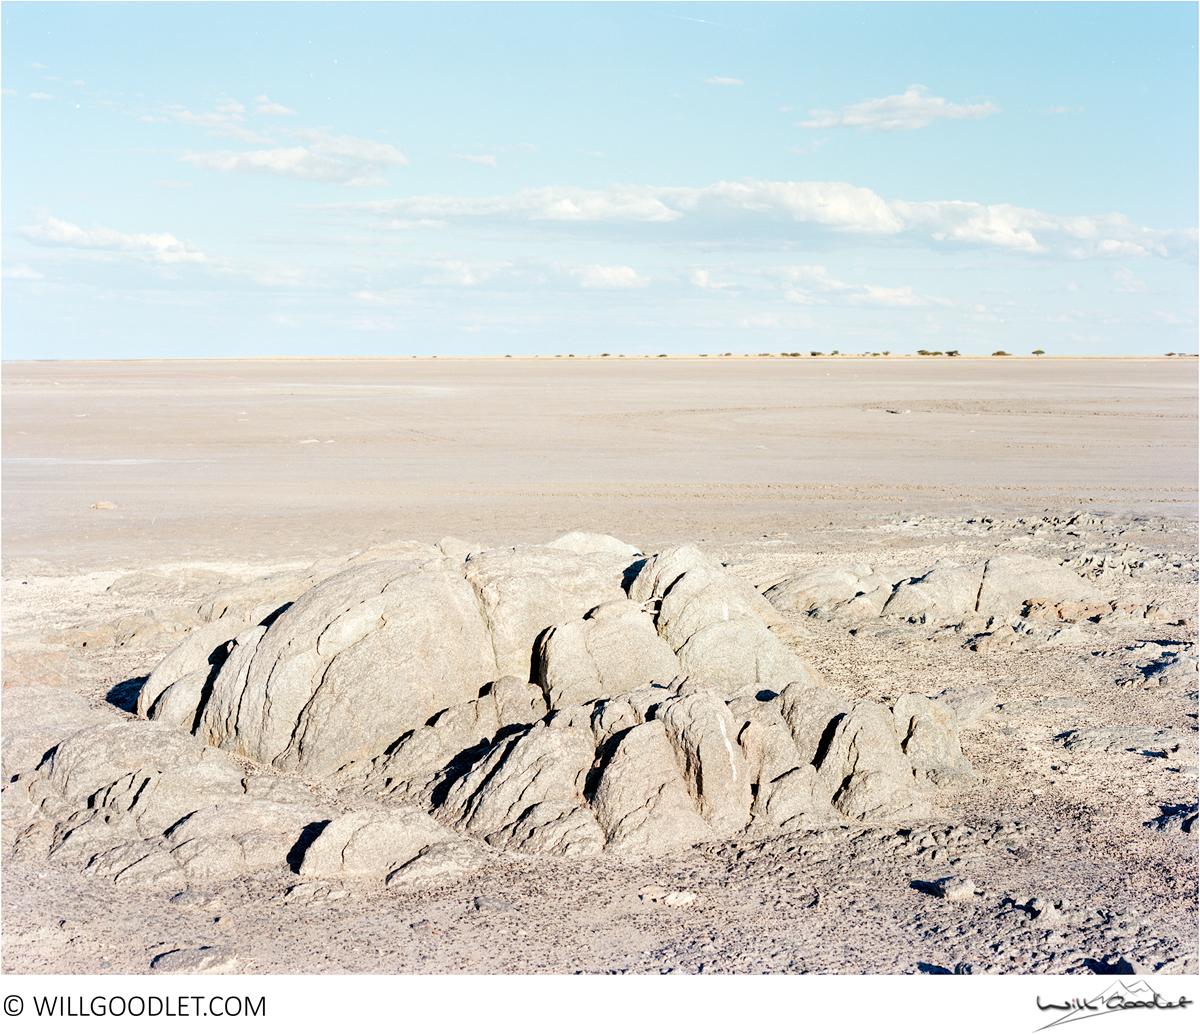 Sea of salt. Mamiya RZ67 Pro ii + 110mm f2.8 Kodak Ektar